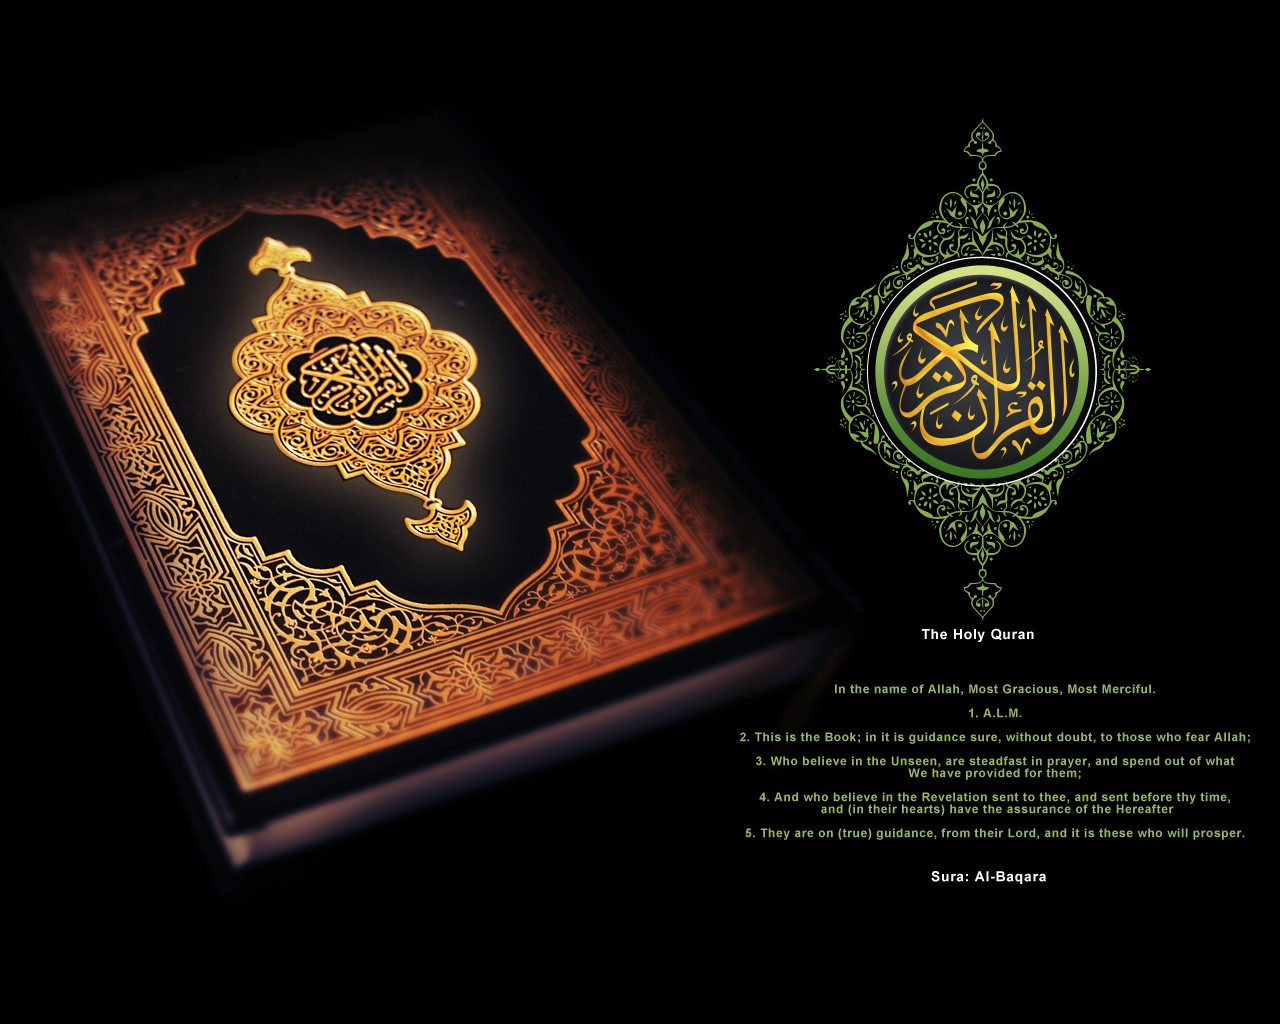 كتاب الصيام, ثبوت دخول شهر رمضان وانقضائه Holy-q10